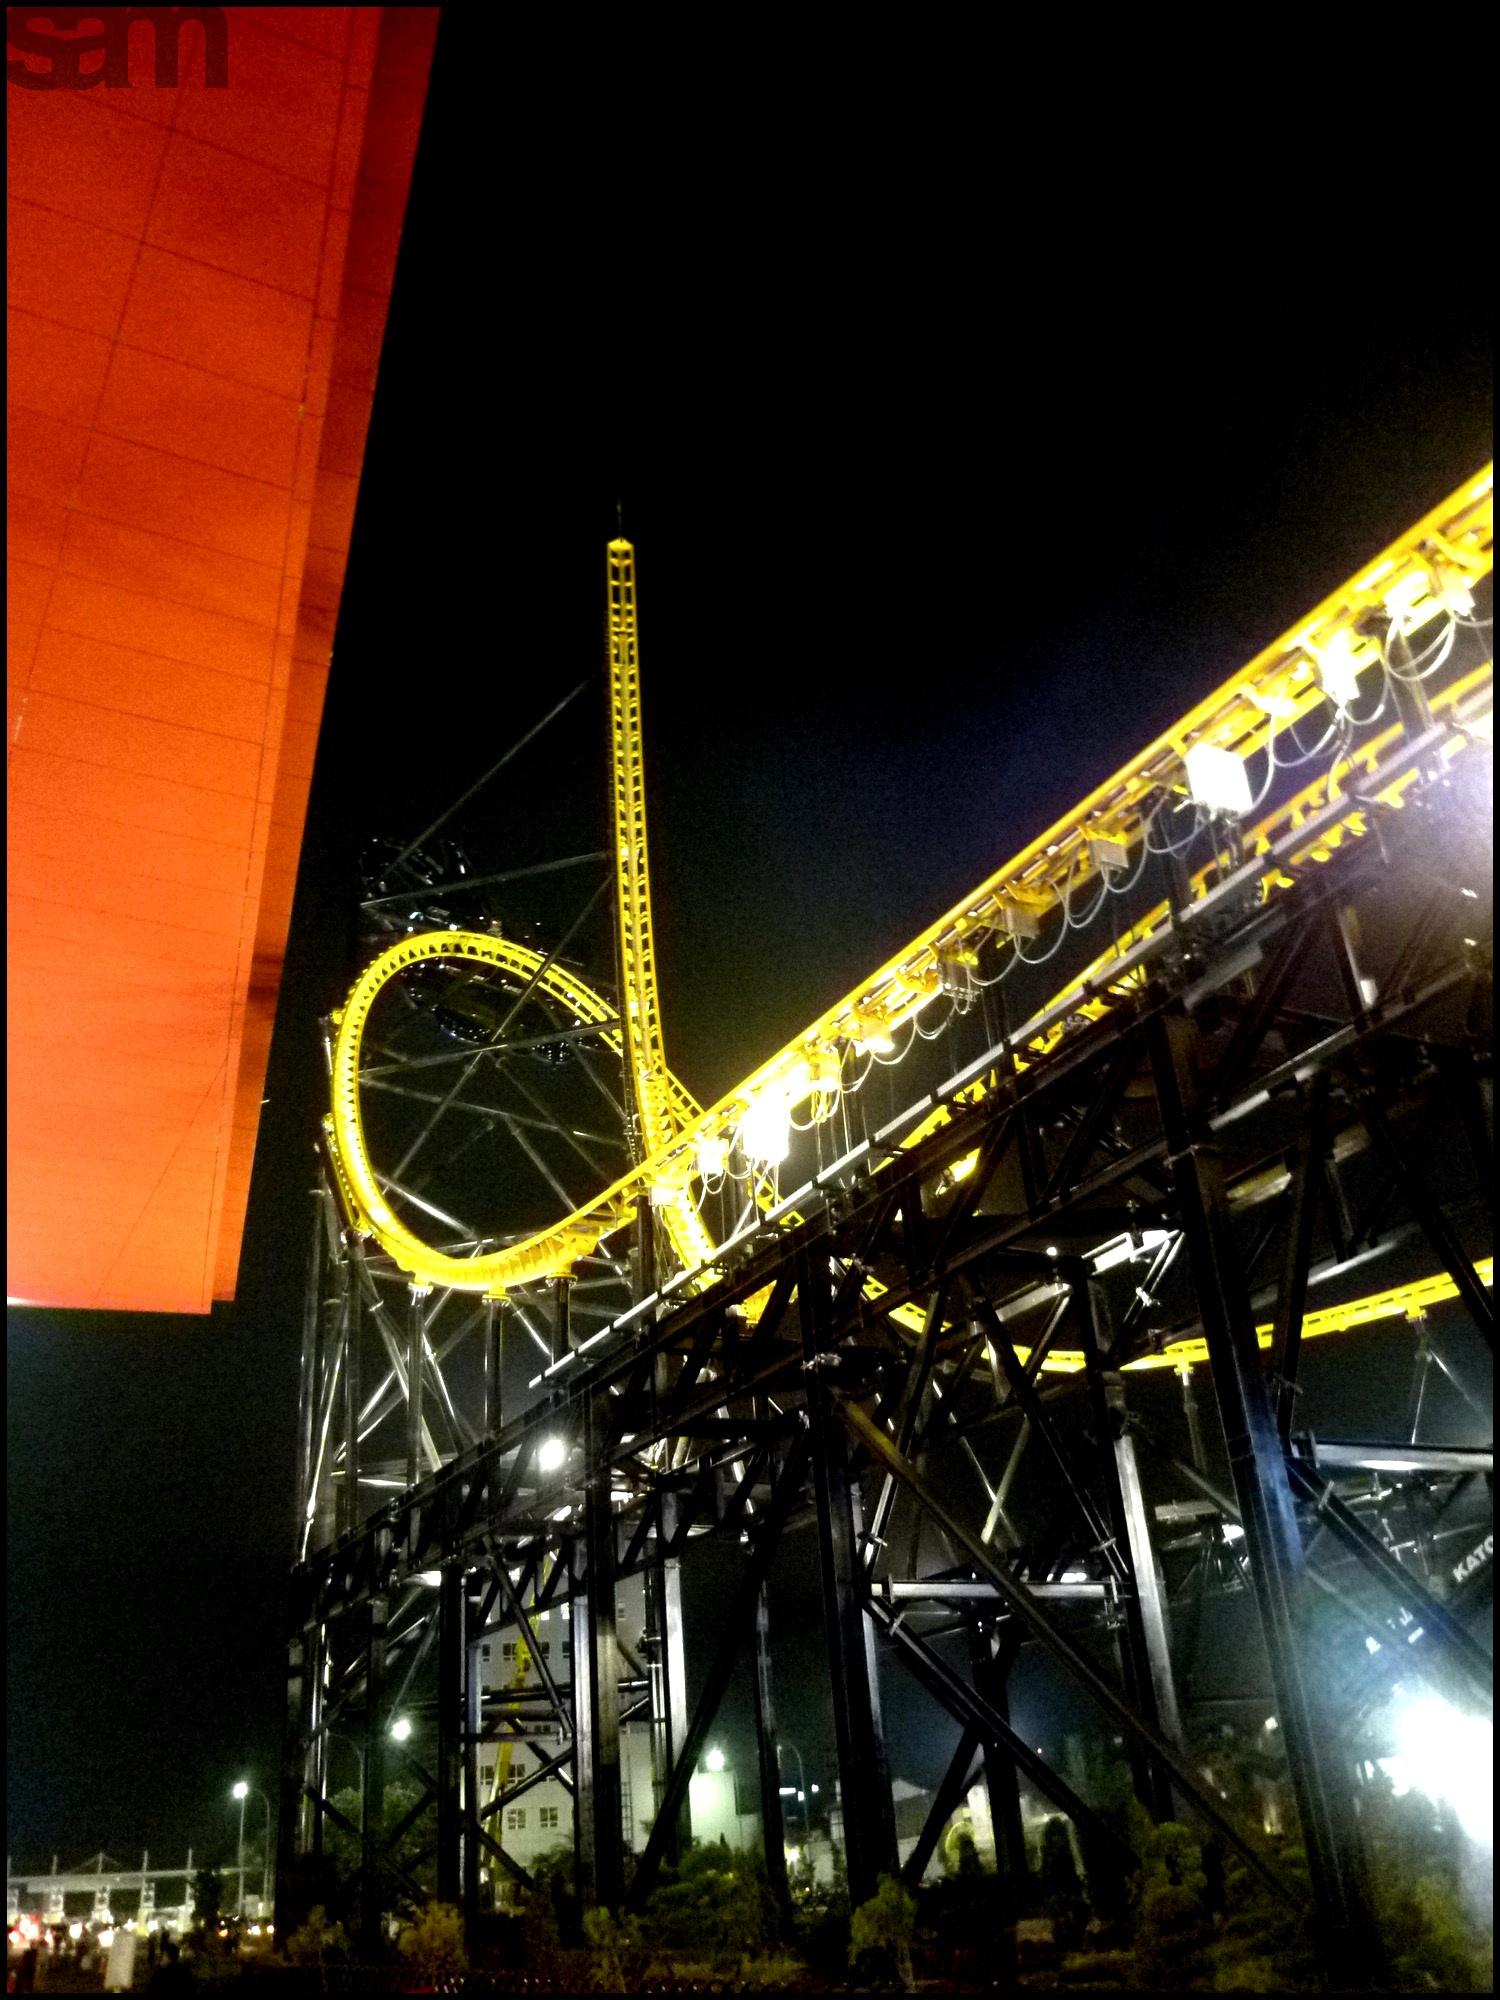 Roller Coaster Trans Studio Mall Bandung Indonesia Nightwalk Kab